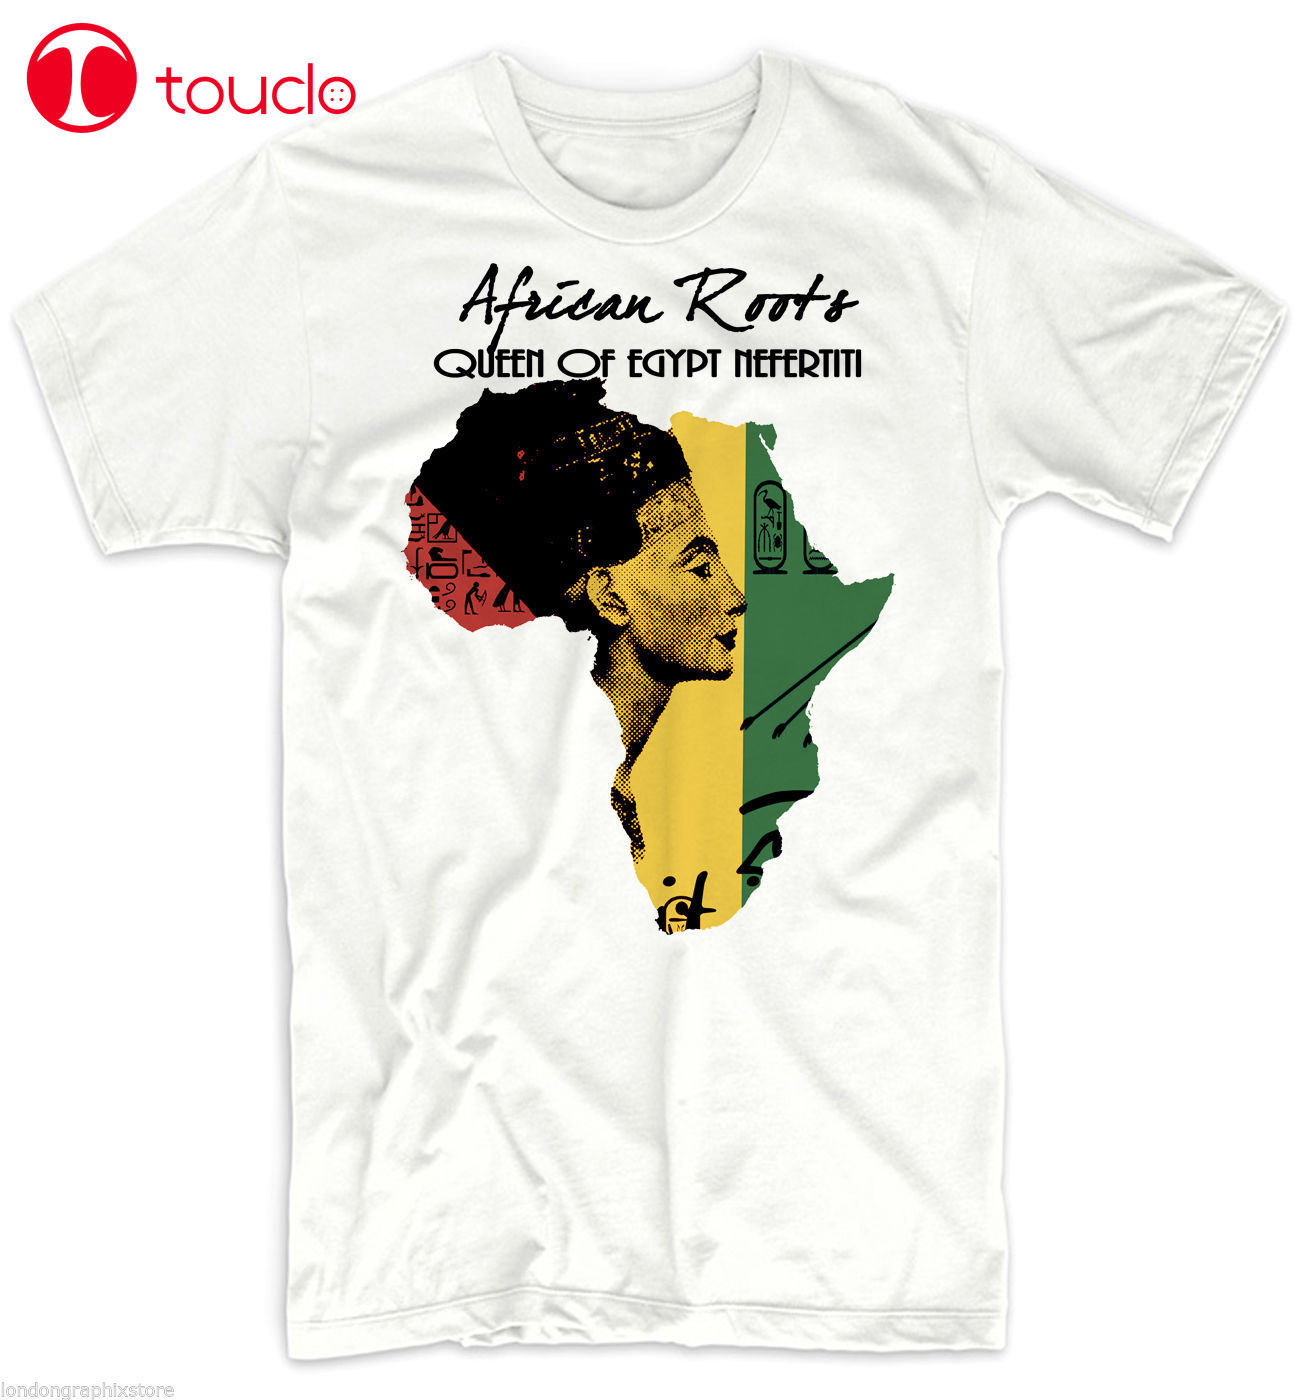 Camiseta de África 2019 para hombres, mapa africano, Historia Negra, Rastafari, Jersey Nefertiti de algodón Reggae